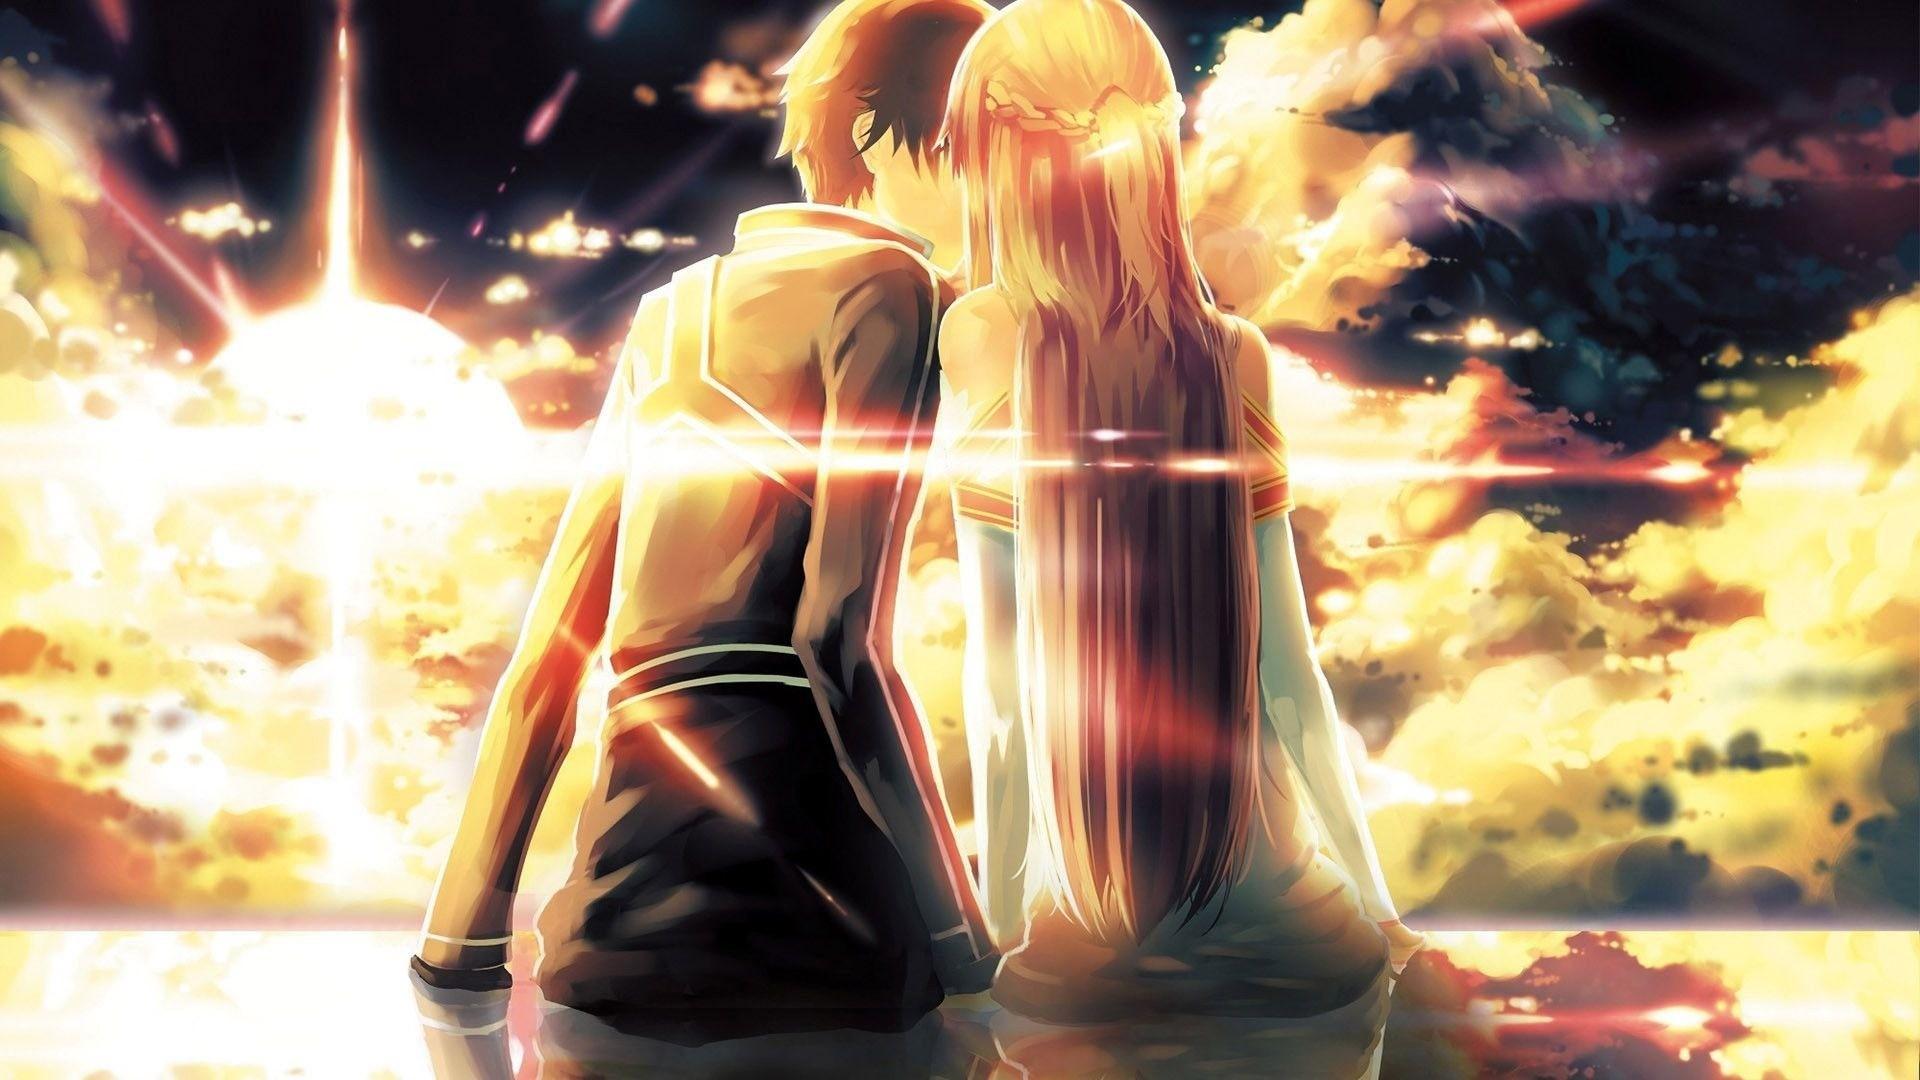 Anime Couple Kiss HD Wallpaper